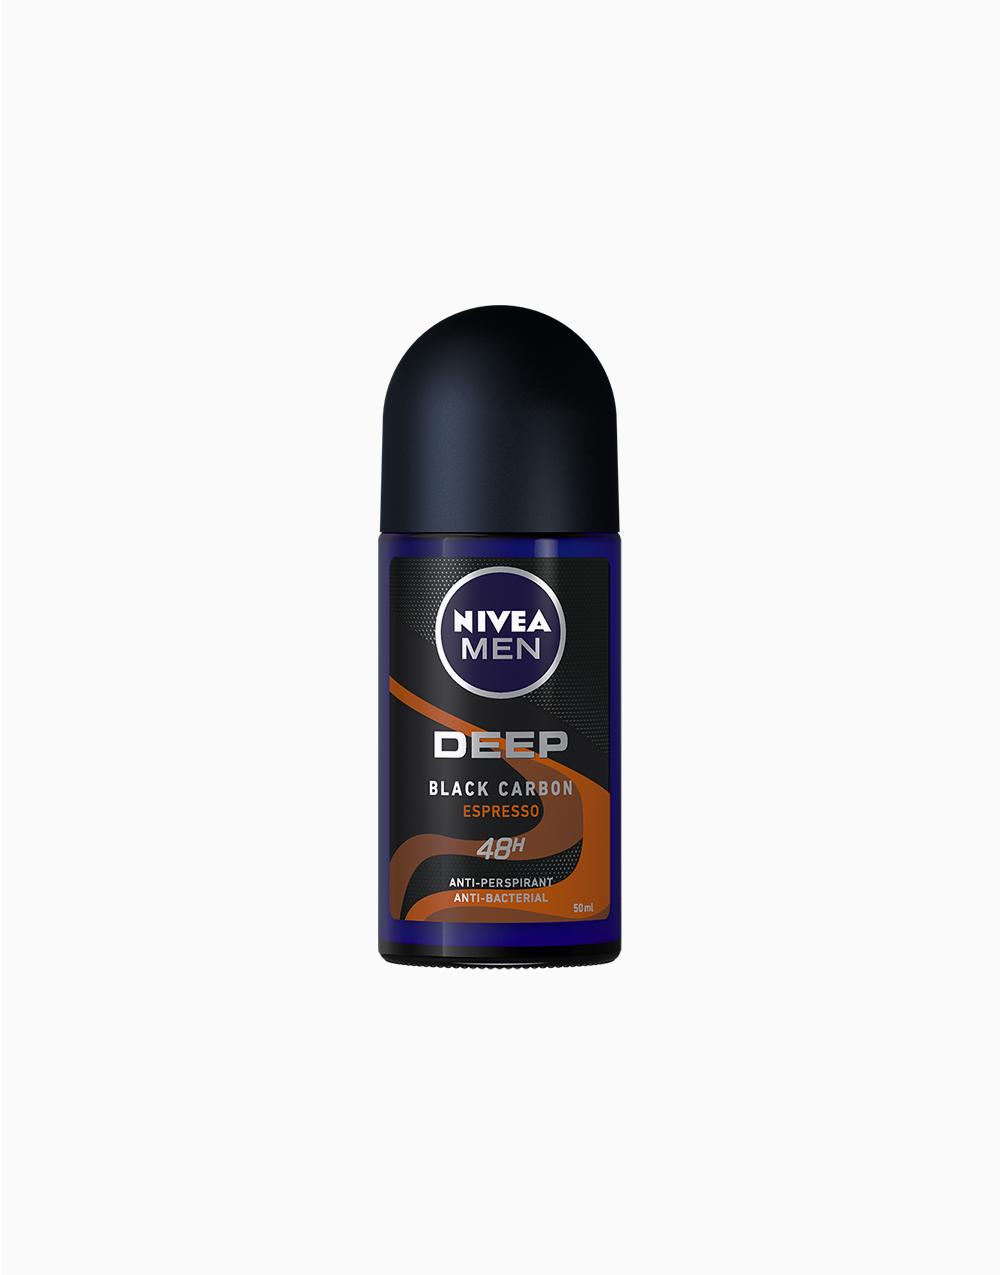 NIVEA Men Deep Espresso Roll On Deodorant (50ml) by NIVEA